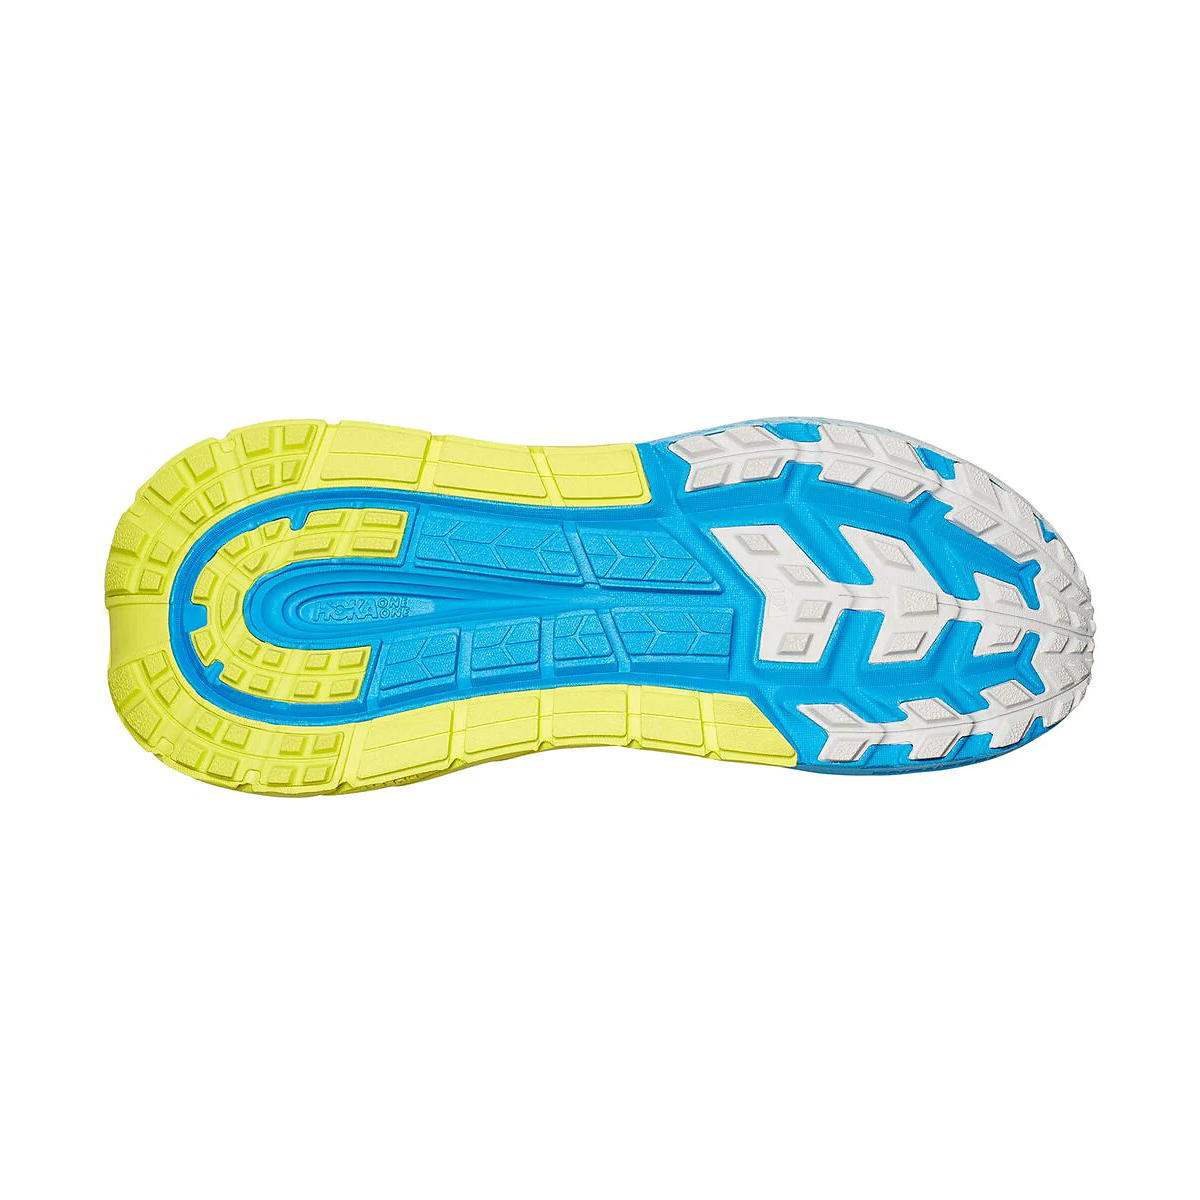 Men's Hoka One One Tennine Running Shoe - Color: Drizzle/Lunar Rock - Size: 8 - Width: Regular, Drizzle/Lunar Rock, large, image 4